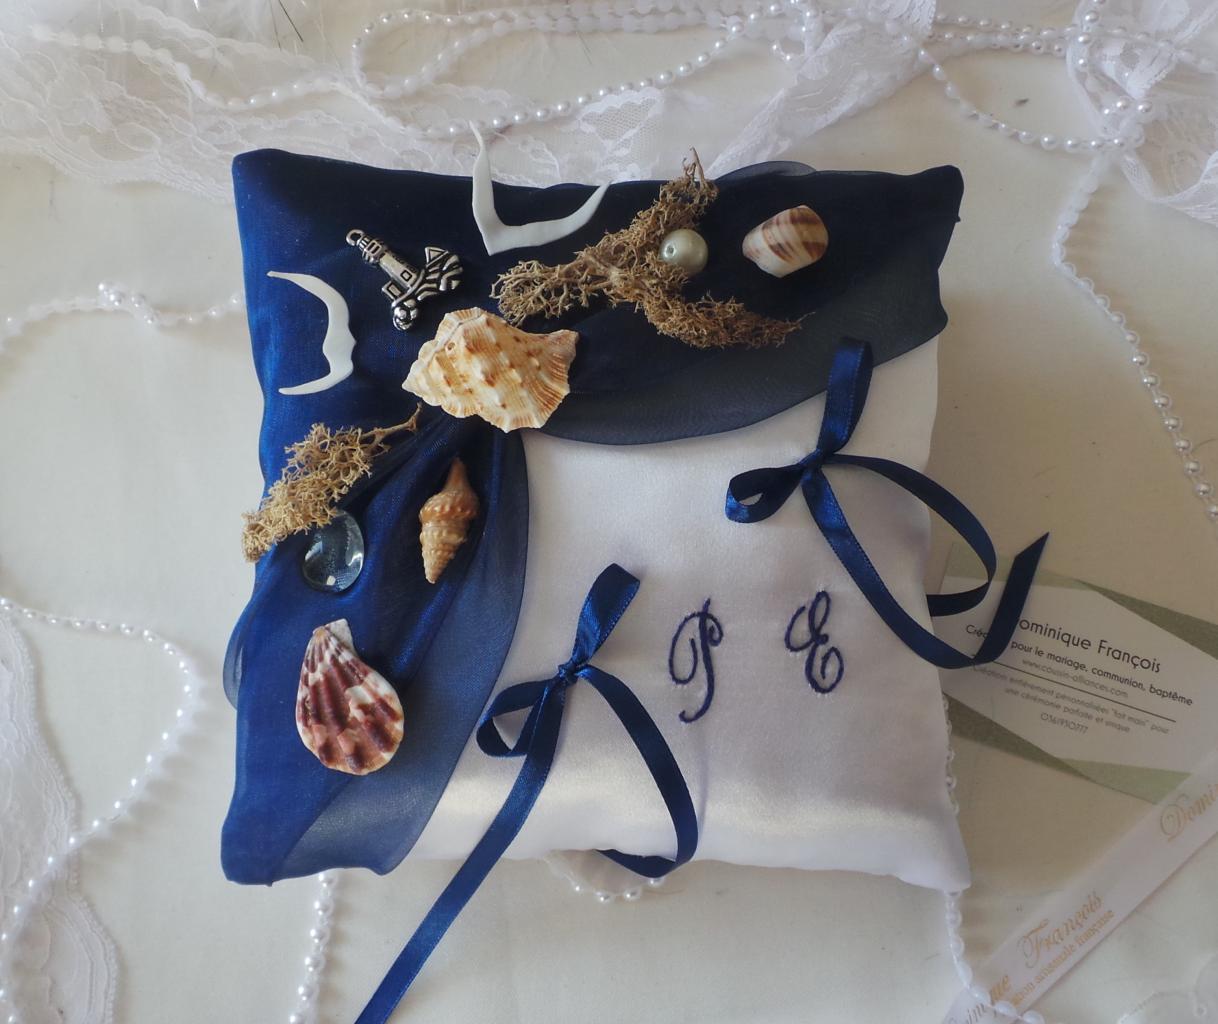 Coussin porte alliances la mer bleu marine roi  (1)